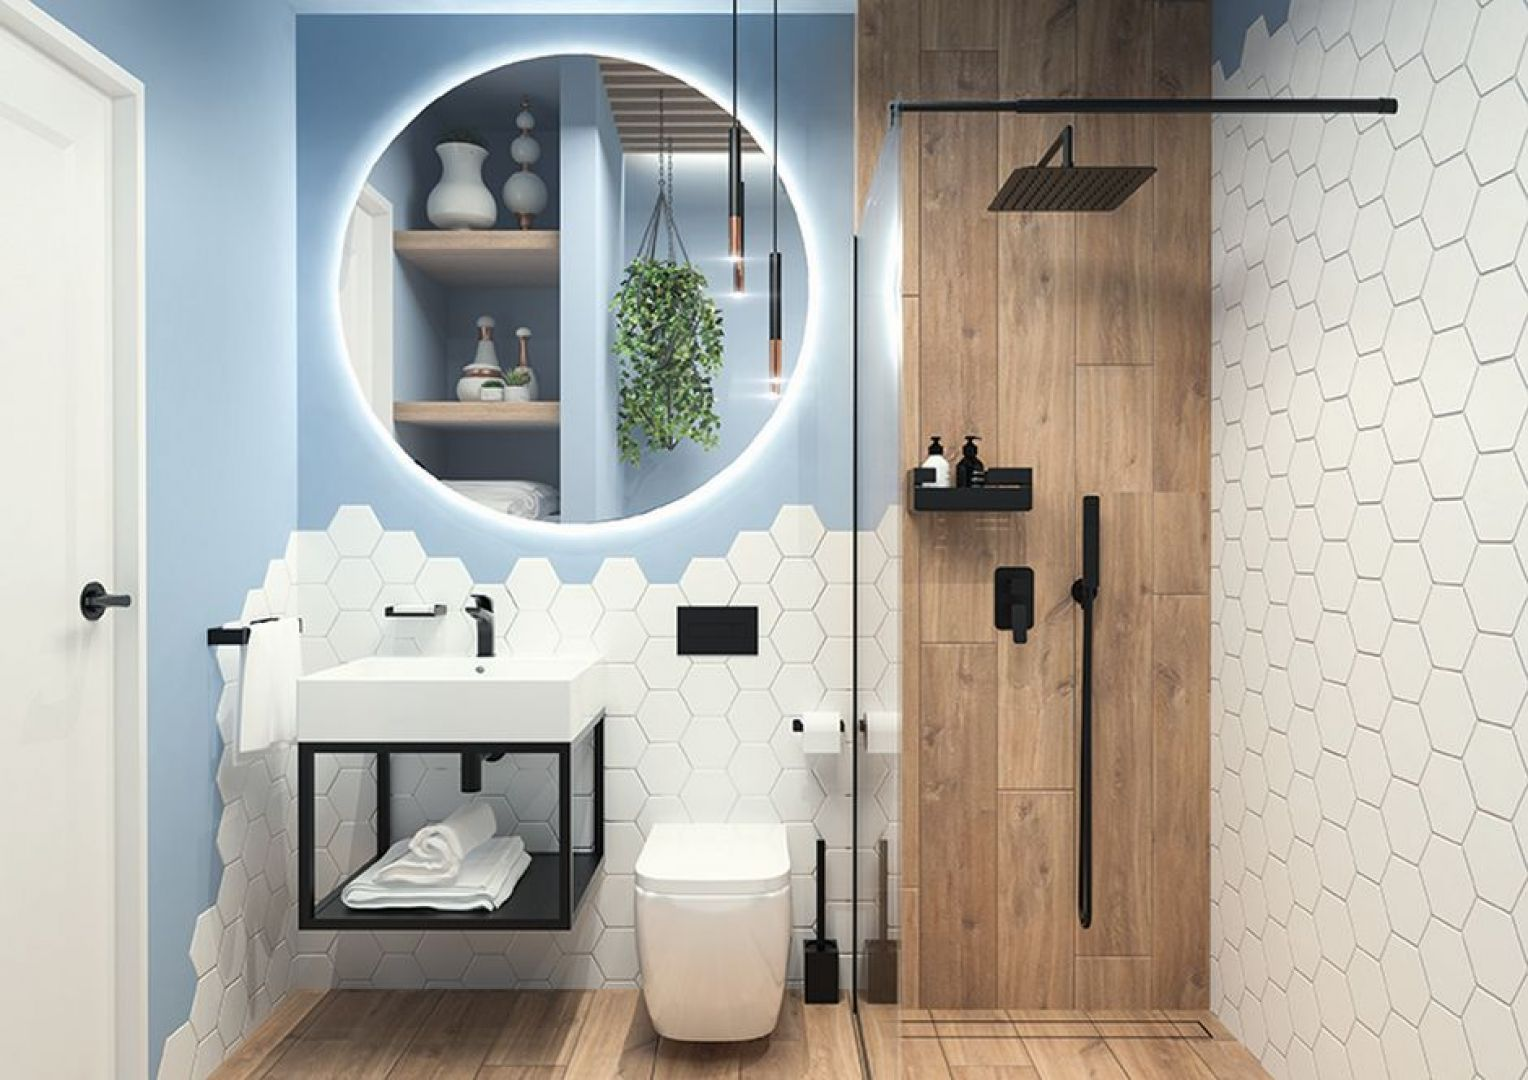 Kolekcja ceramiki sanitarnej Hiacynt. Fot. Deante